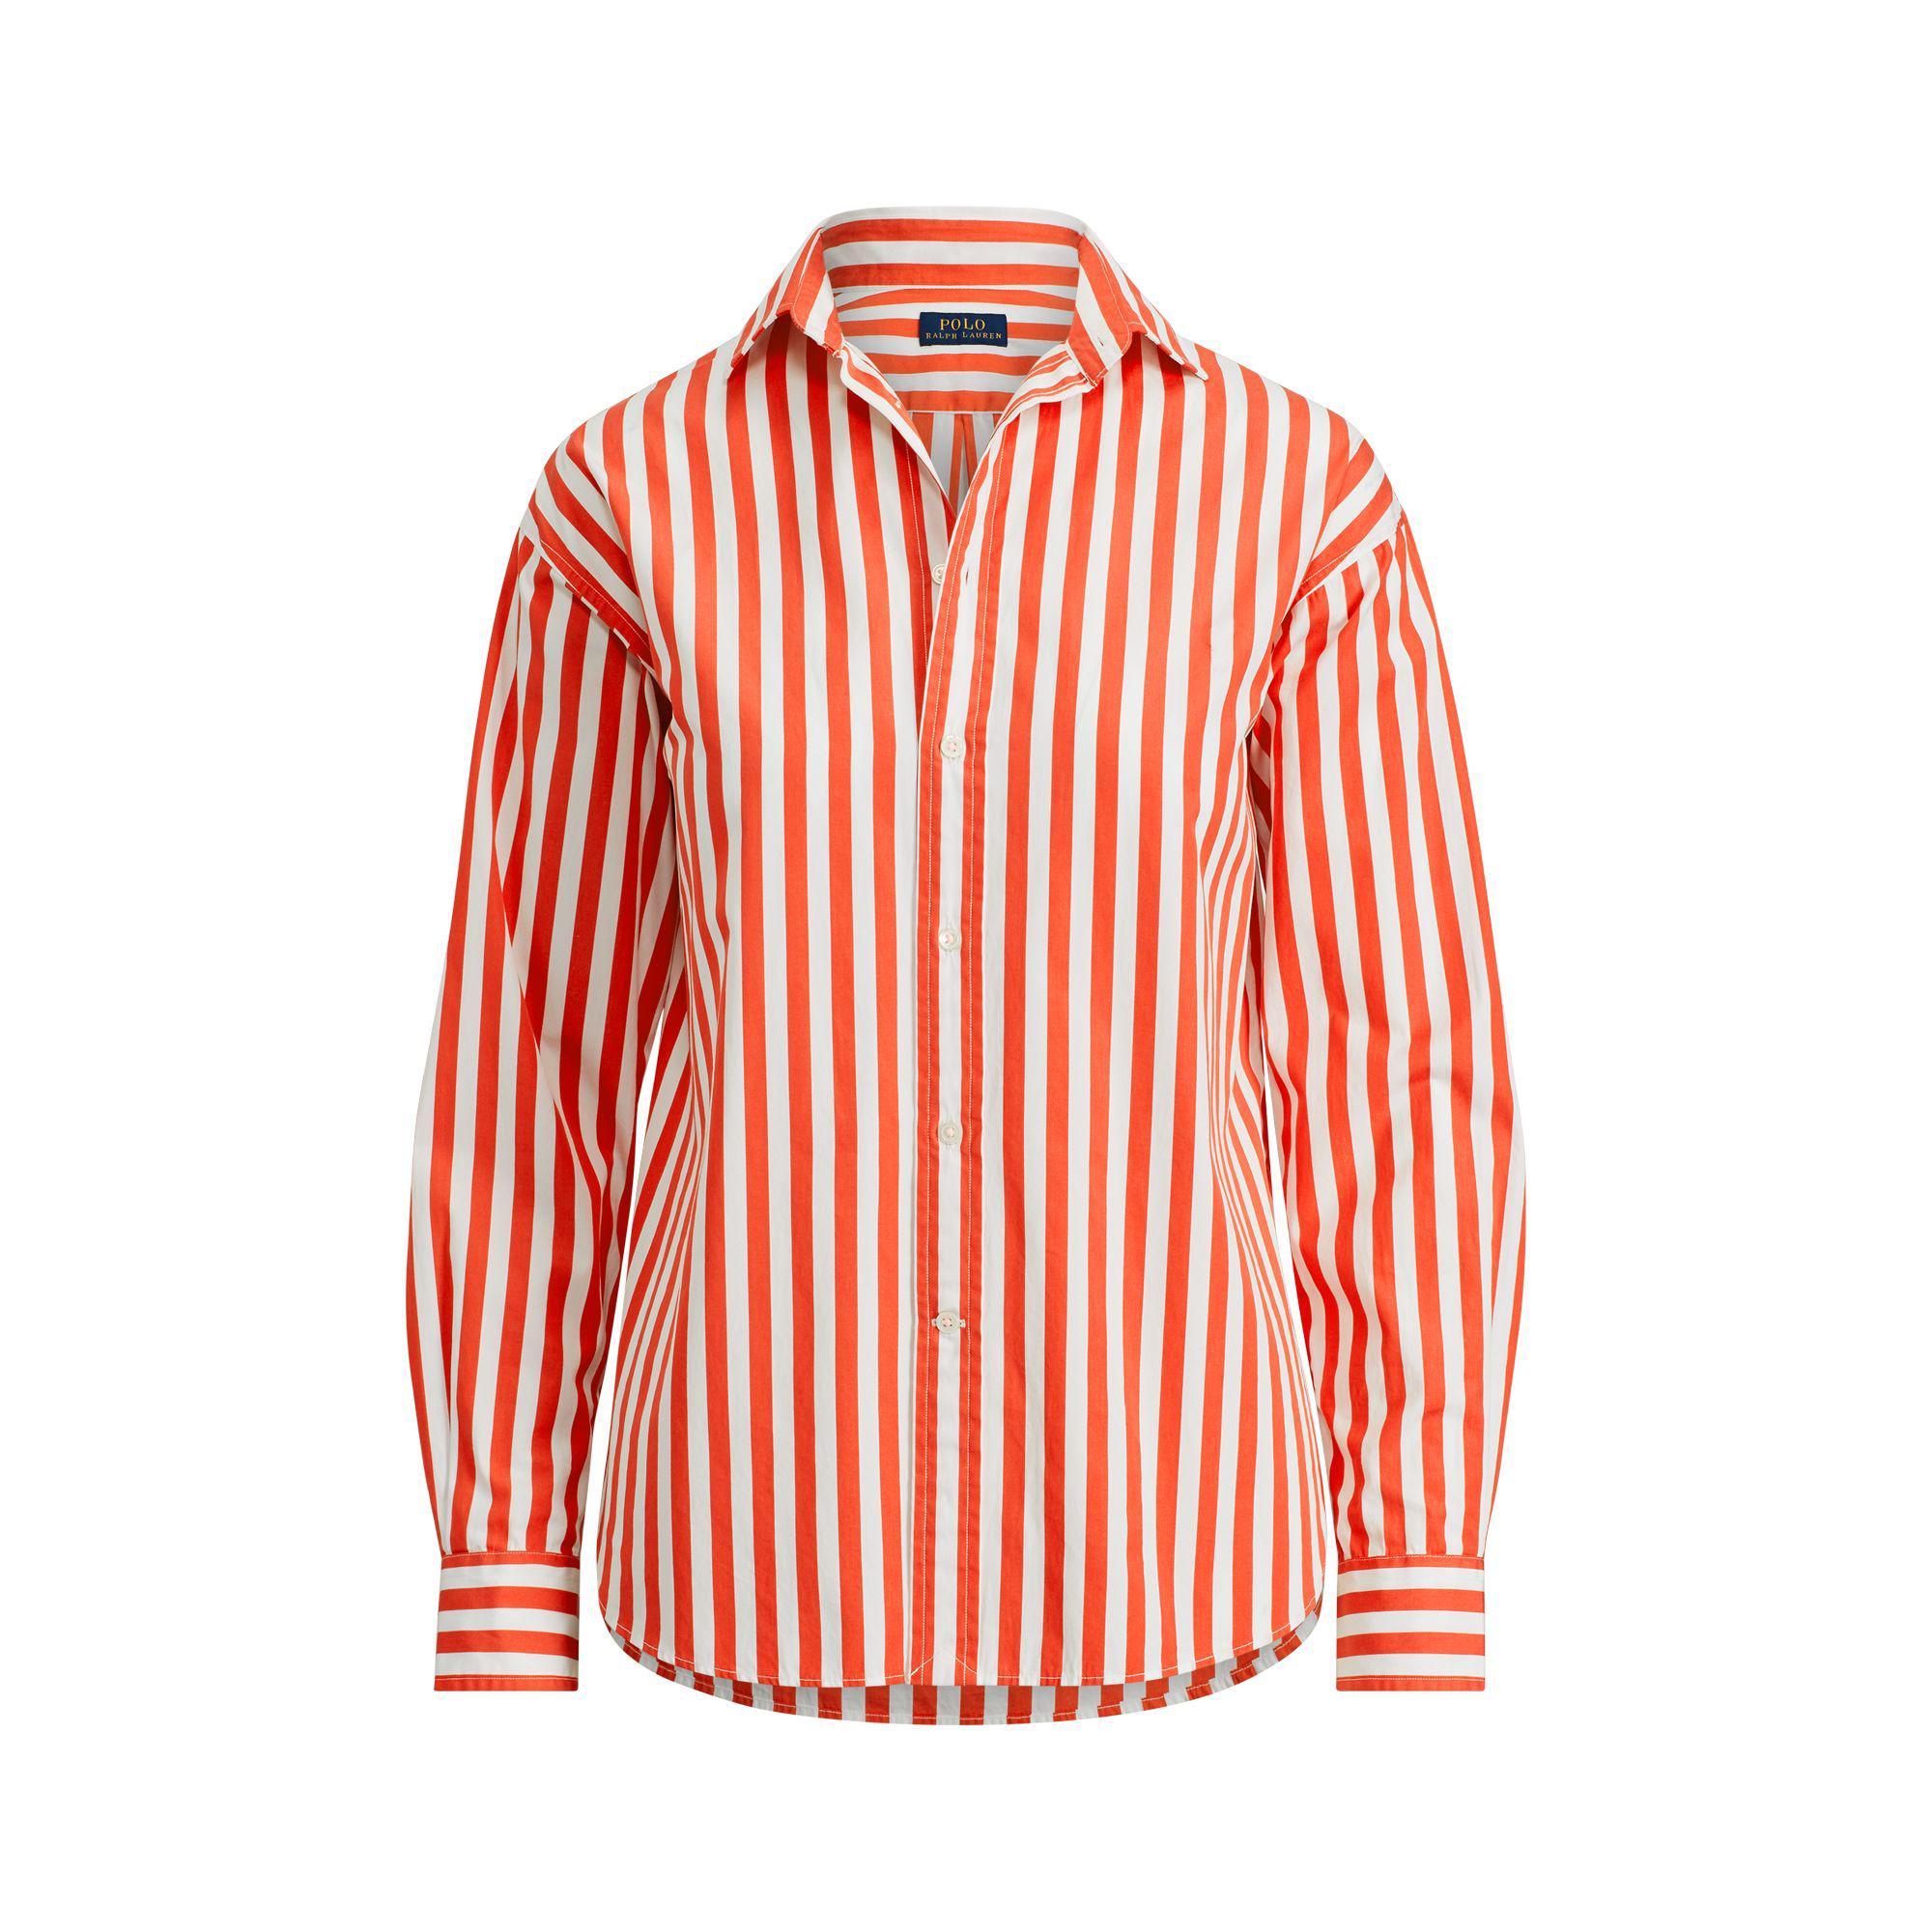 Lyst - Polo Ralph Lauren Bengal-stripe Cotton Shirt in Red c4319e01a36